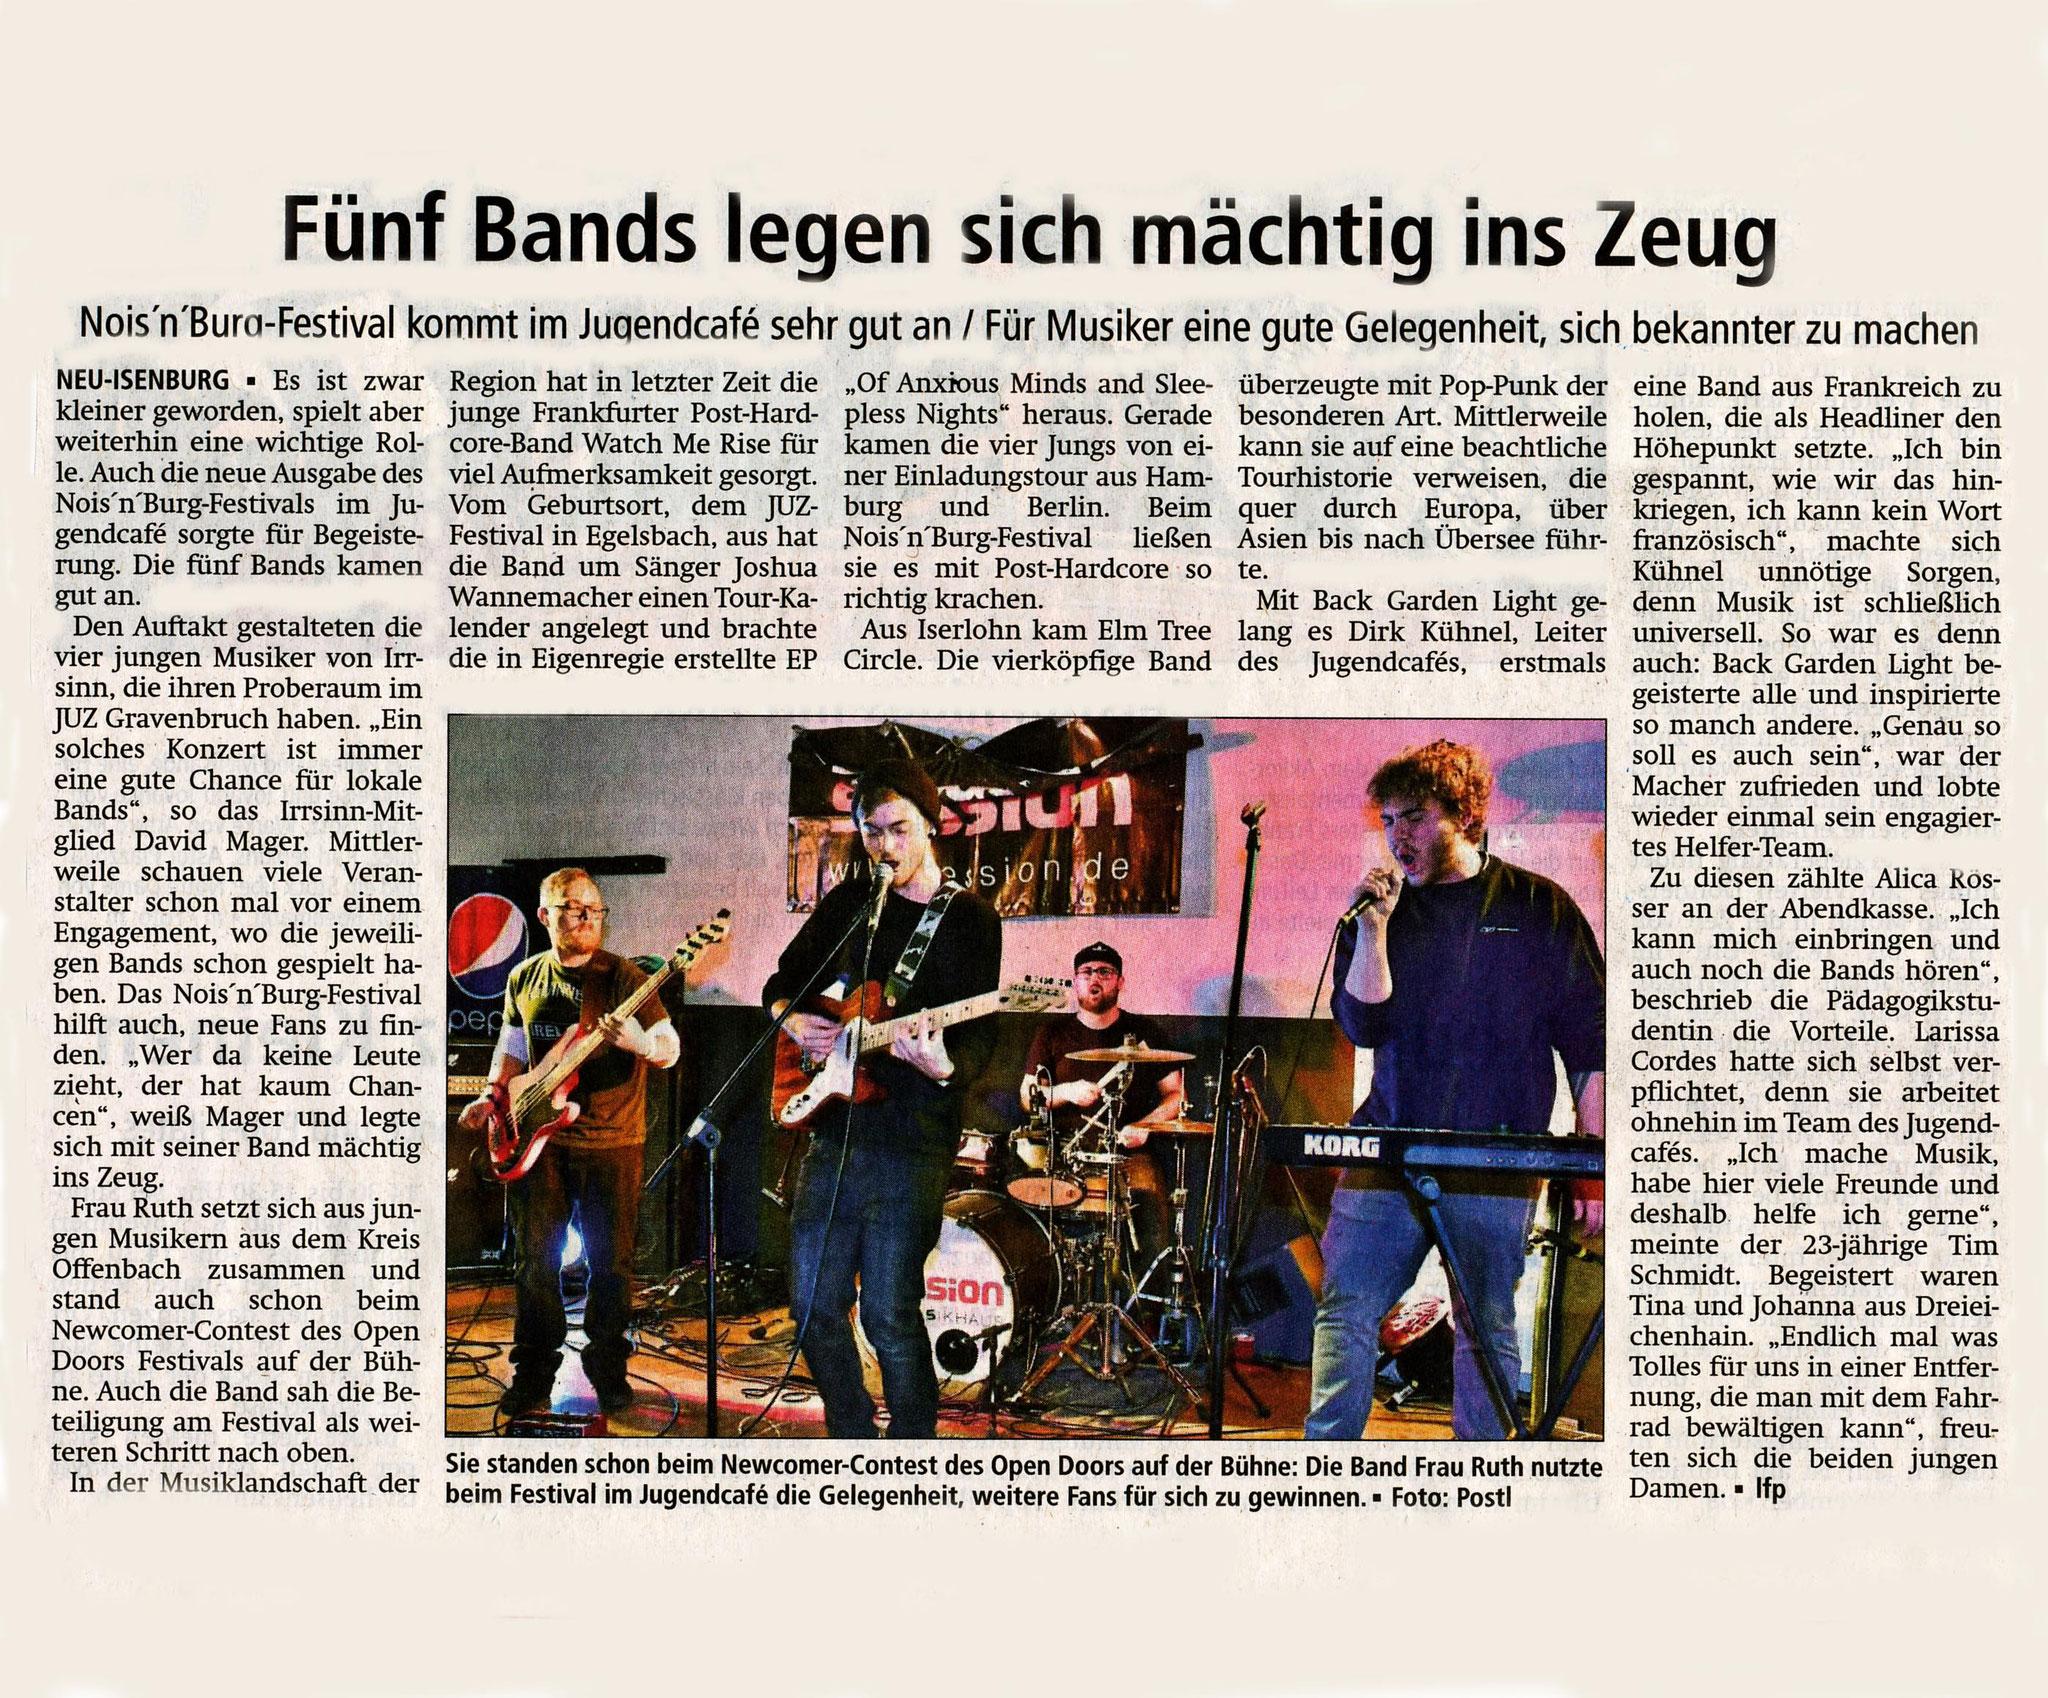 Offenbach Post, 24. Oktober 2018